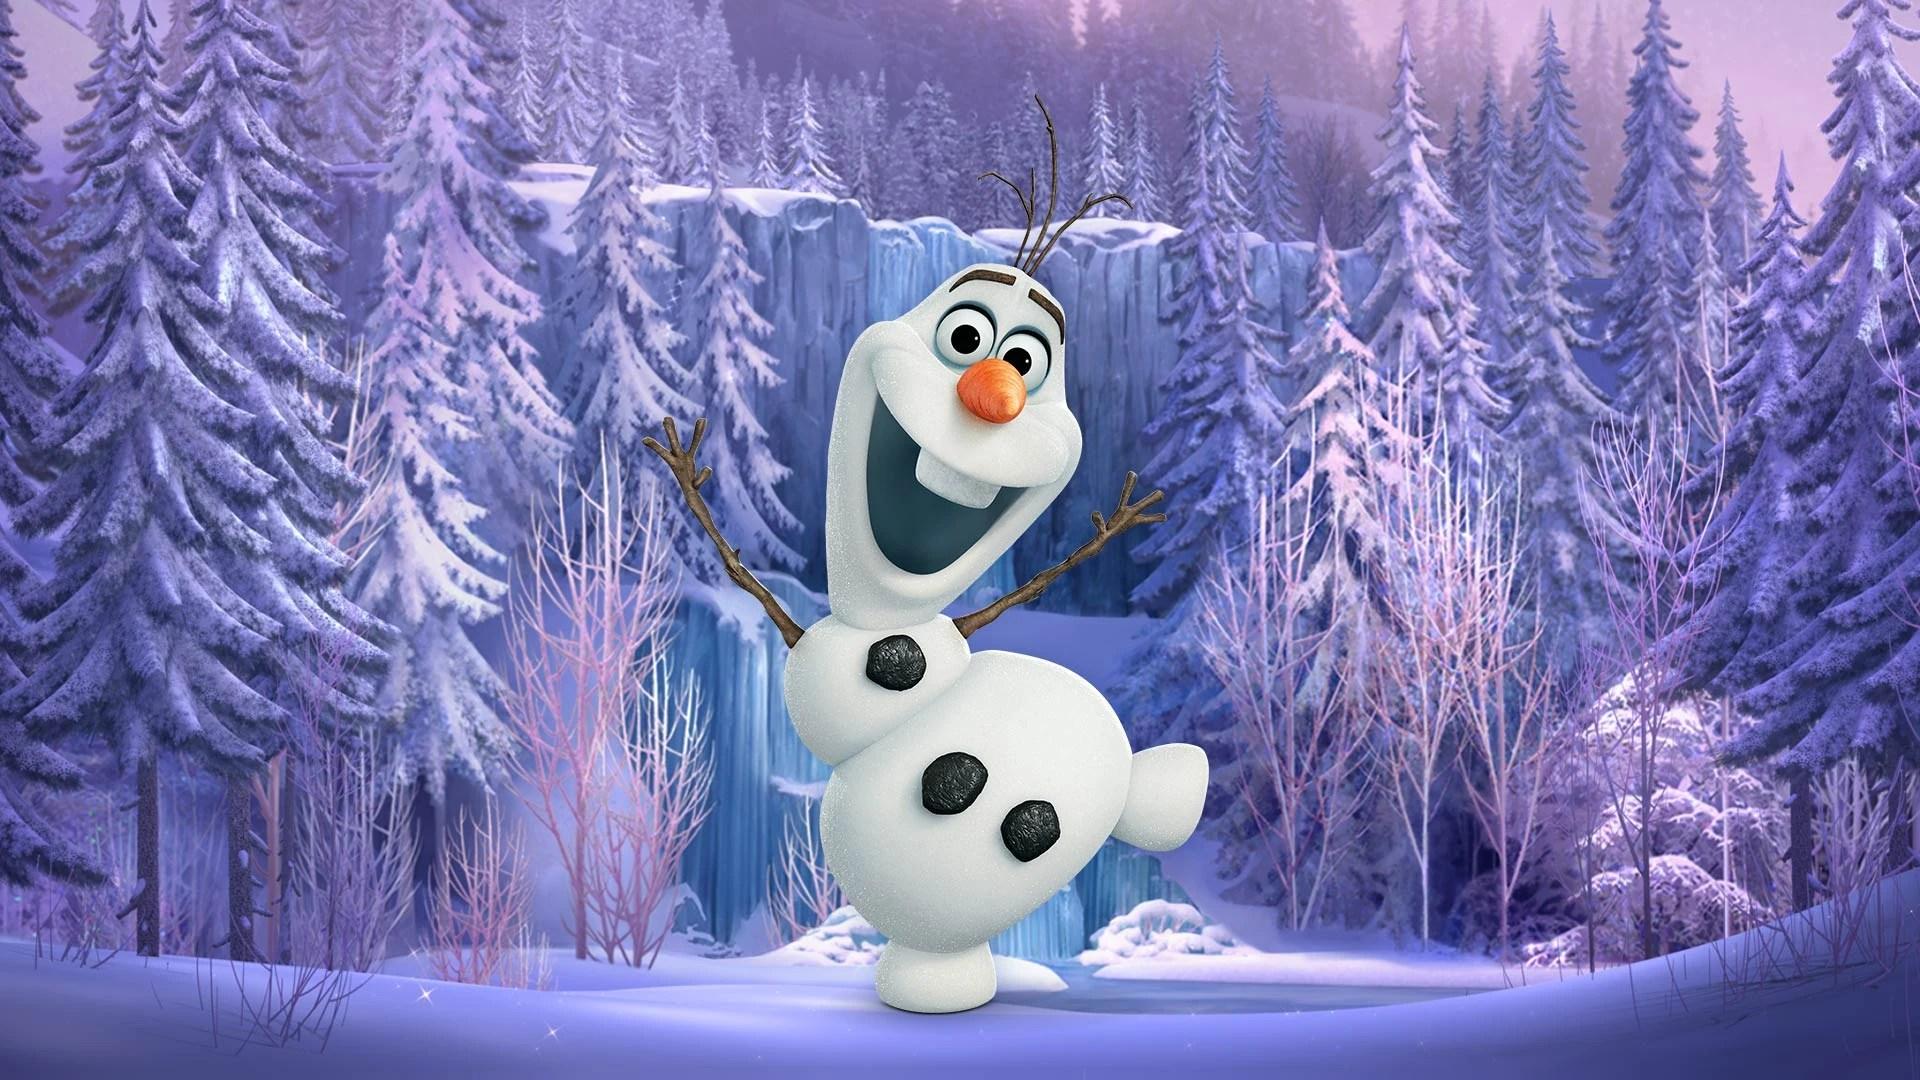 Descendants Of The Sun Hd Wallpaper Frozen Free Fall Snowball Fight Olaf Joy Steam